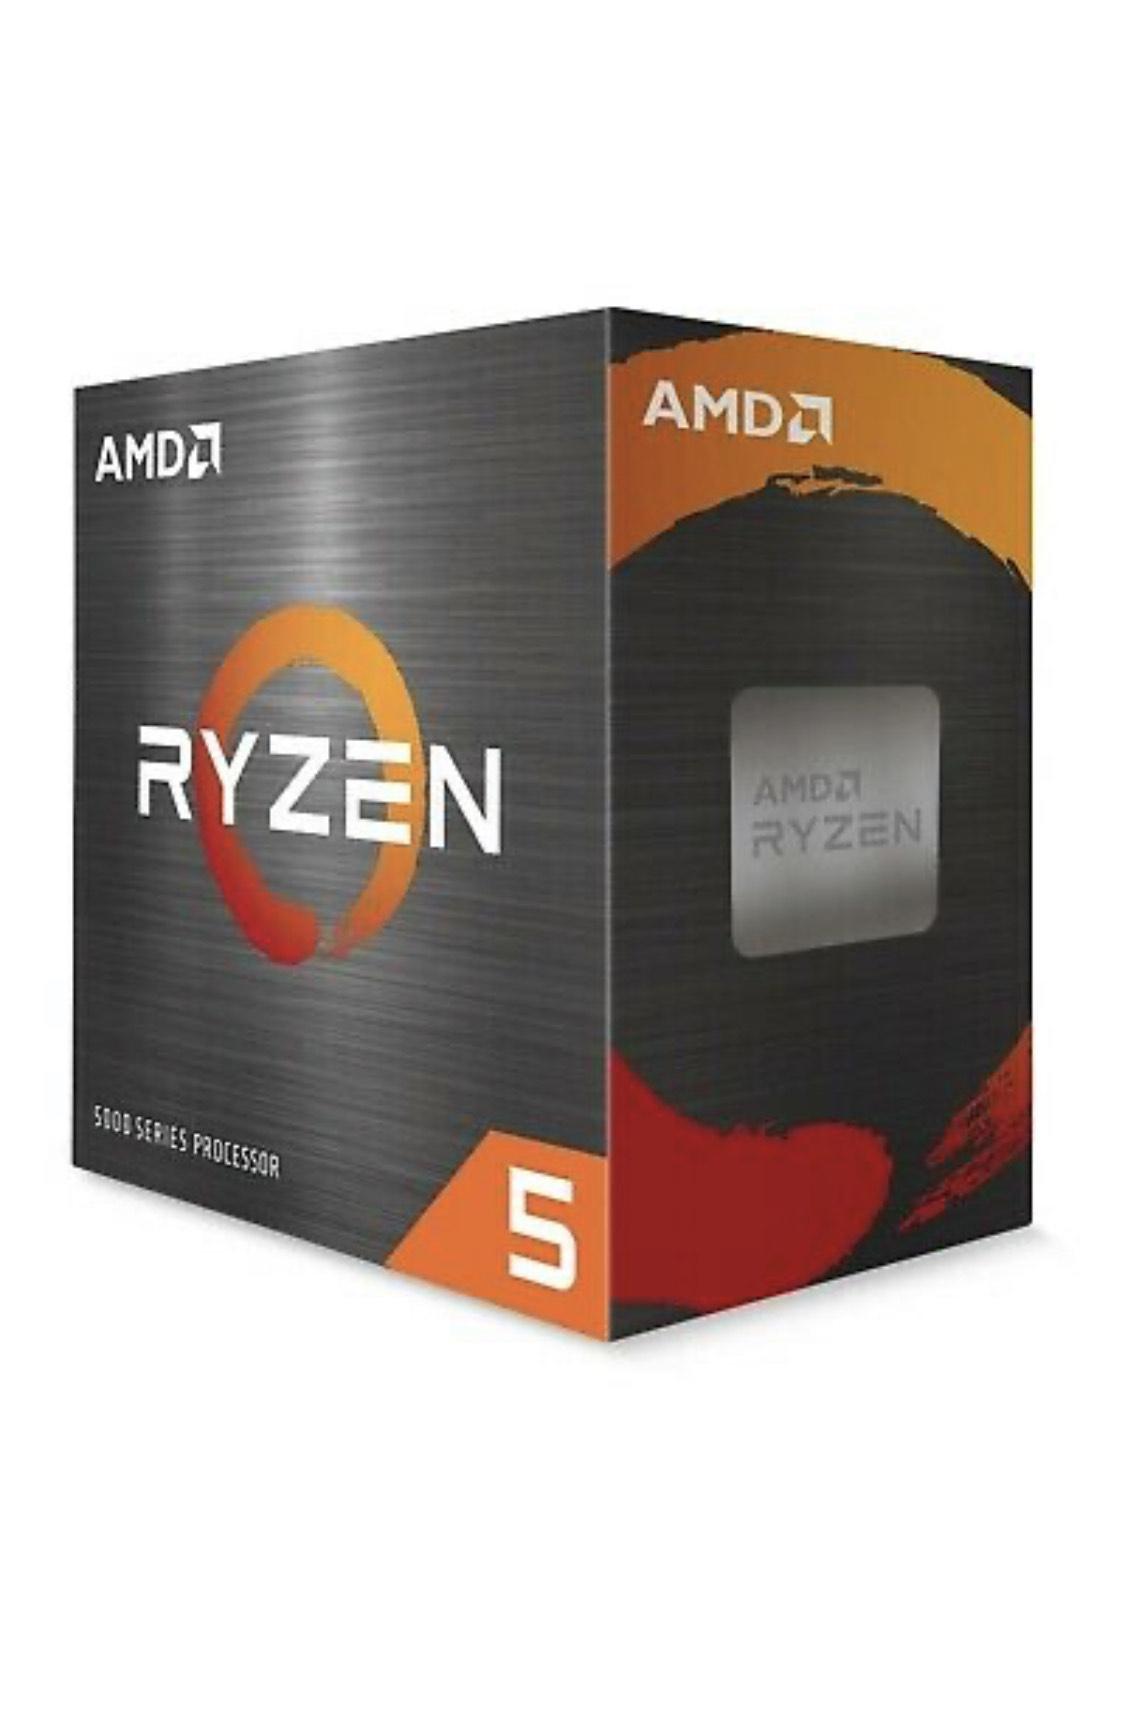 AMD Ryzen 5 5600X Boxed Prozessor, 6C/12T, 3,7GHz-4,6GHz, 100-100000065BOX (Ausstellungsstück)